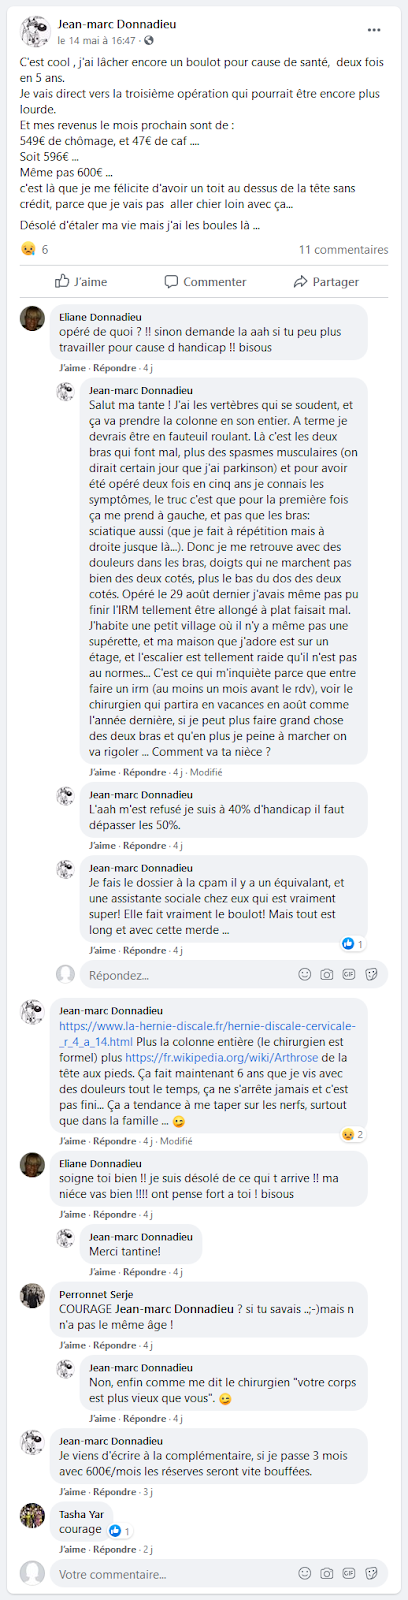 Jean-marc%2BDonnadieu%2Bmalade%2B-%2BFacebook%2B-%2Bwww.facebook.com dans Luraghi